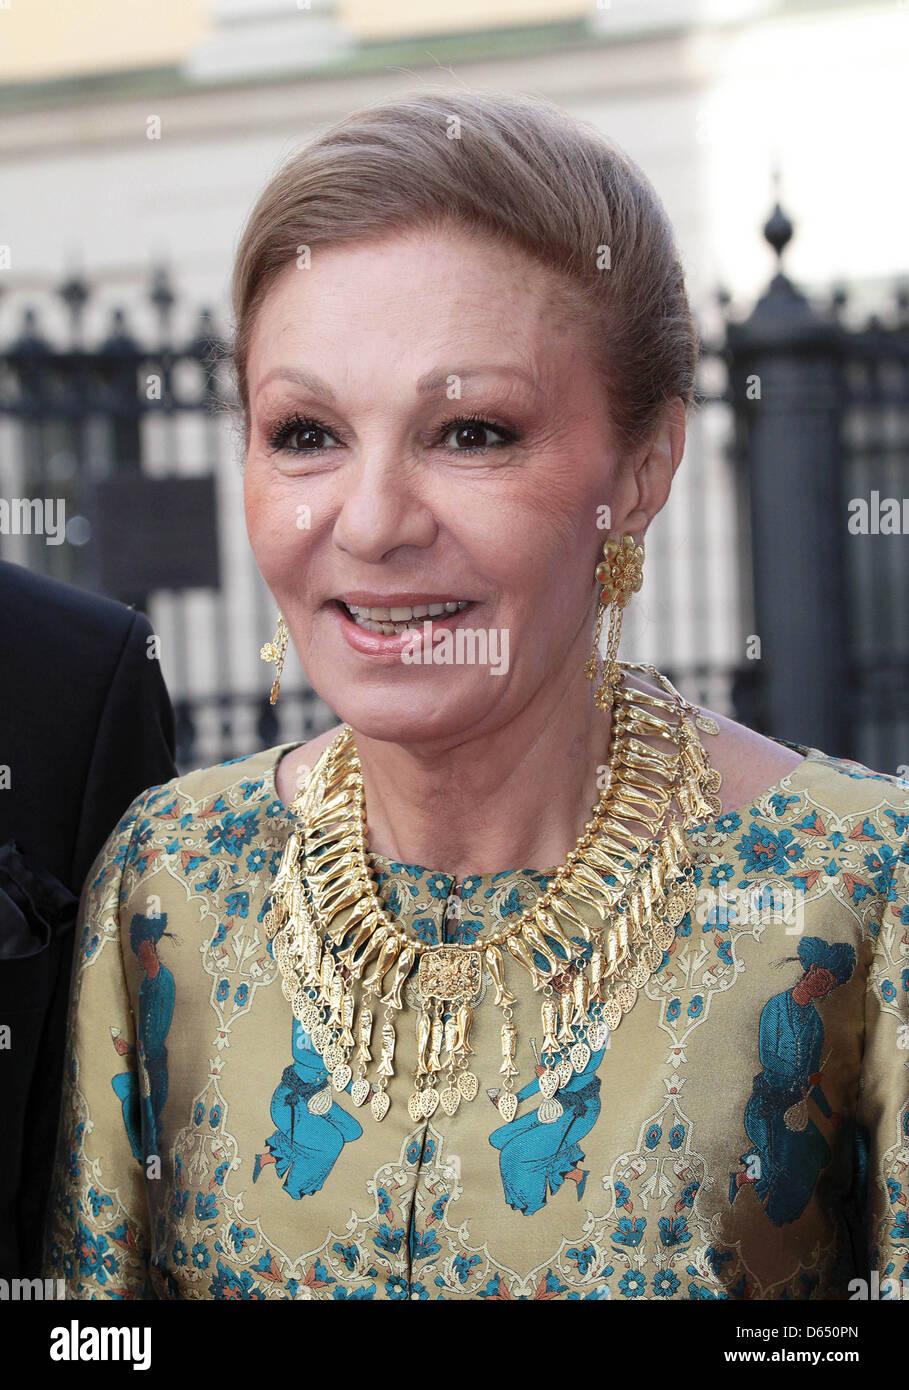 1000 images about shah farah royal family on pinterest for Shah bano farah pahlavi